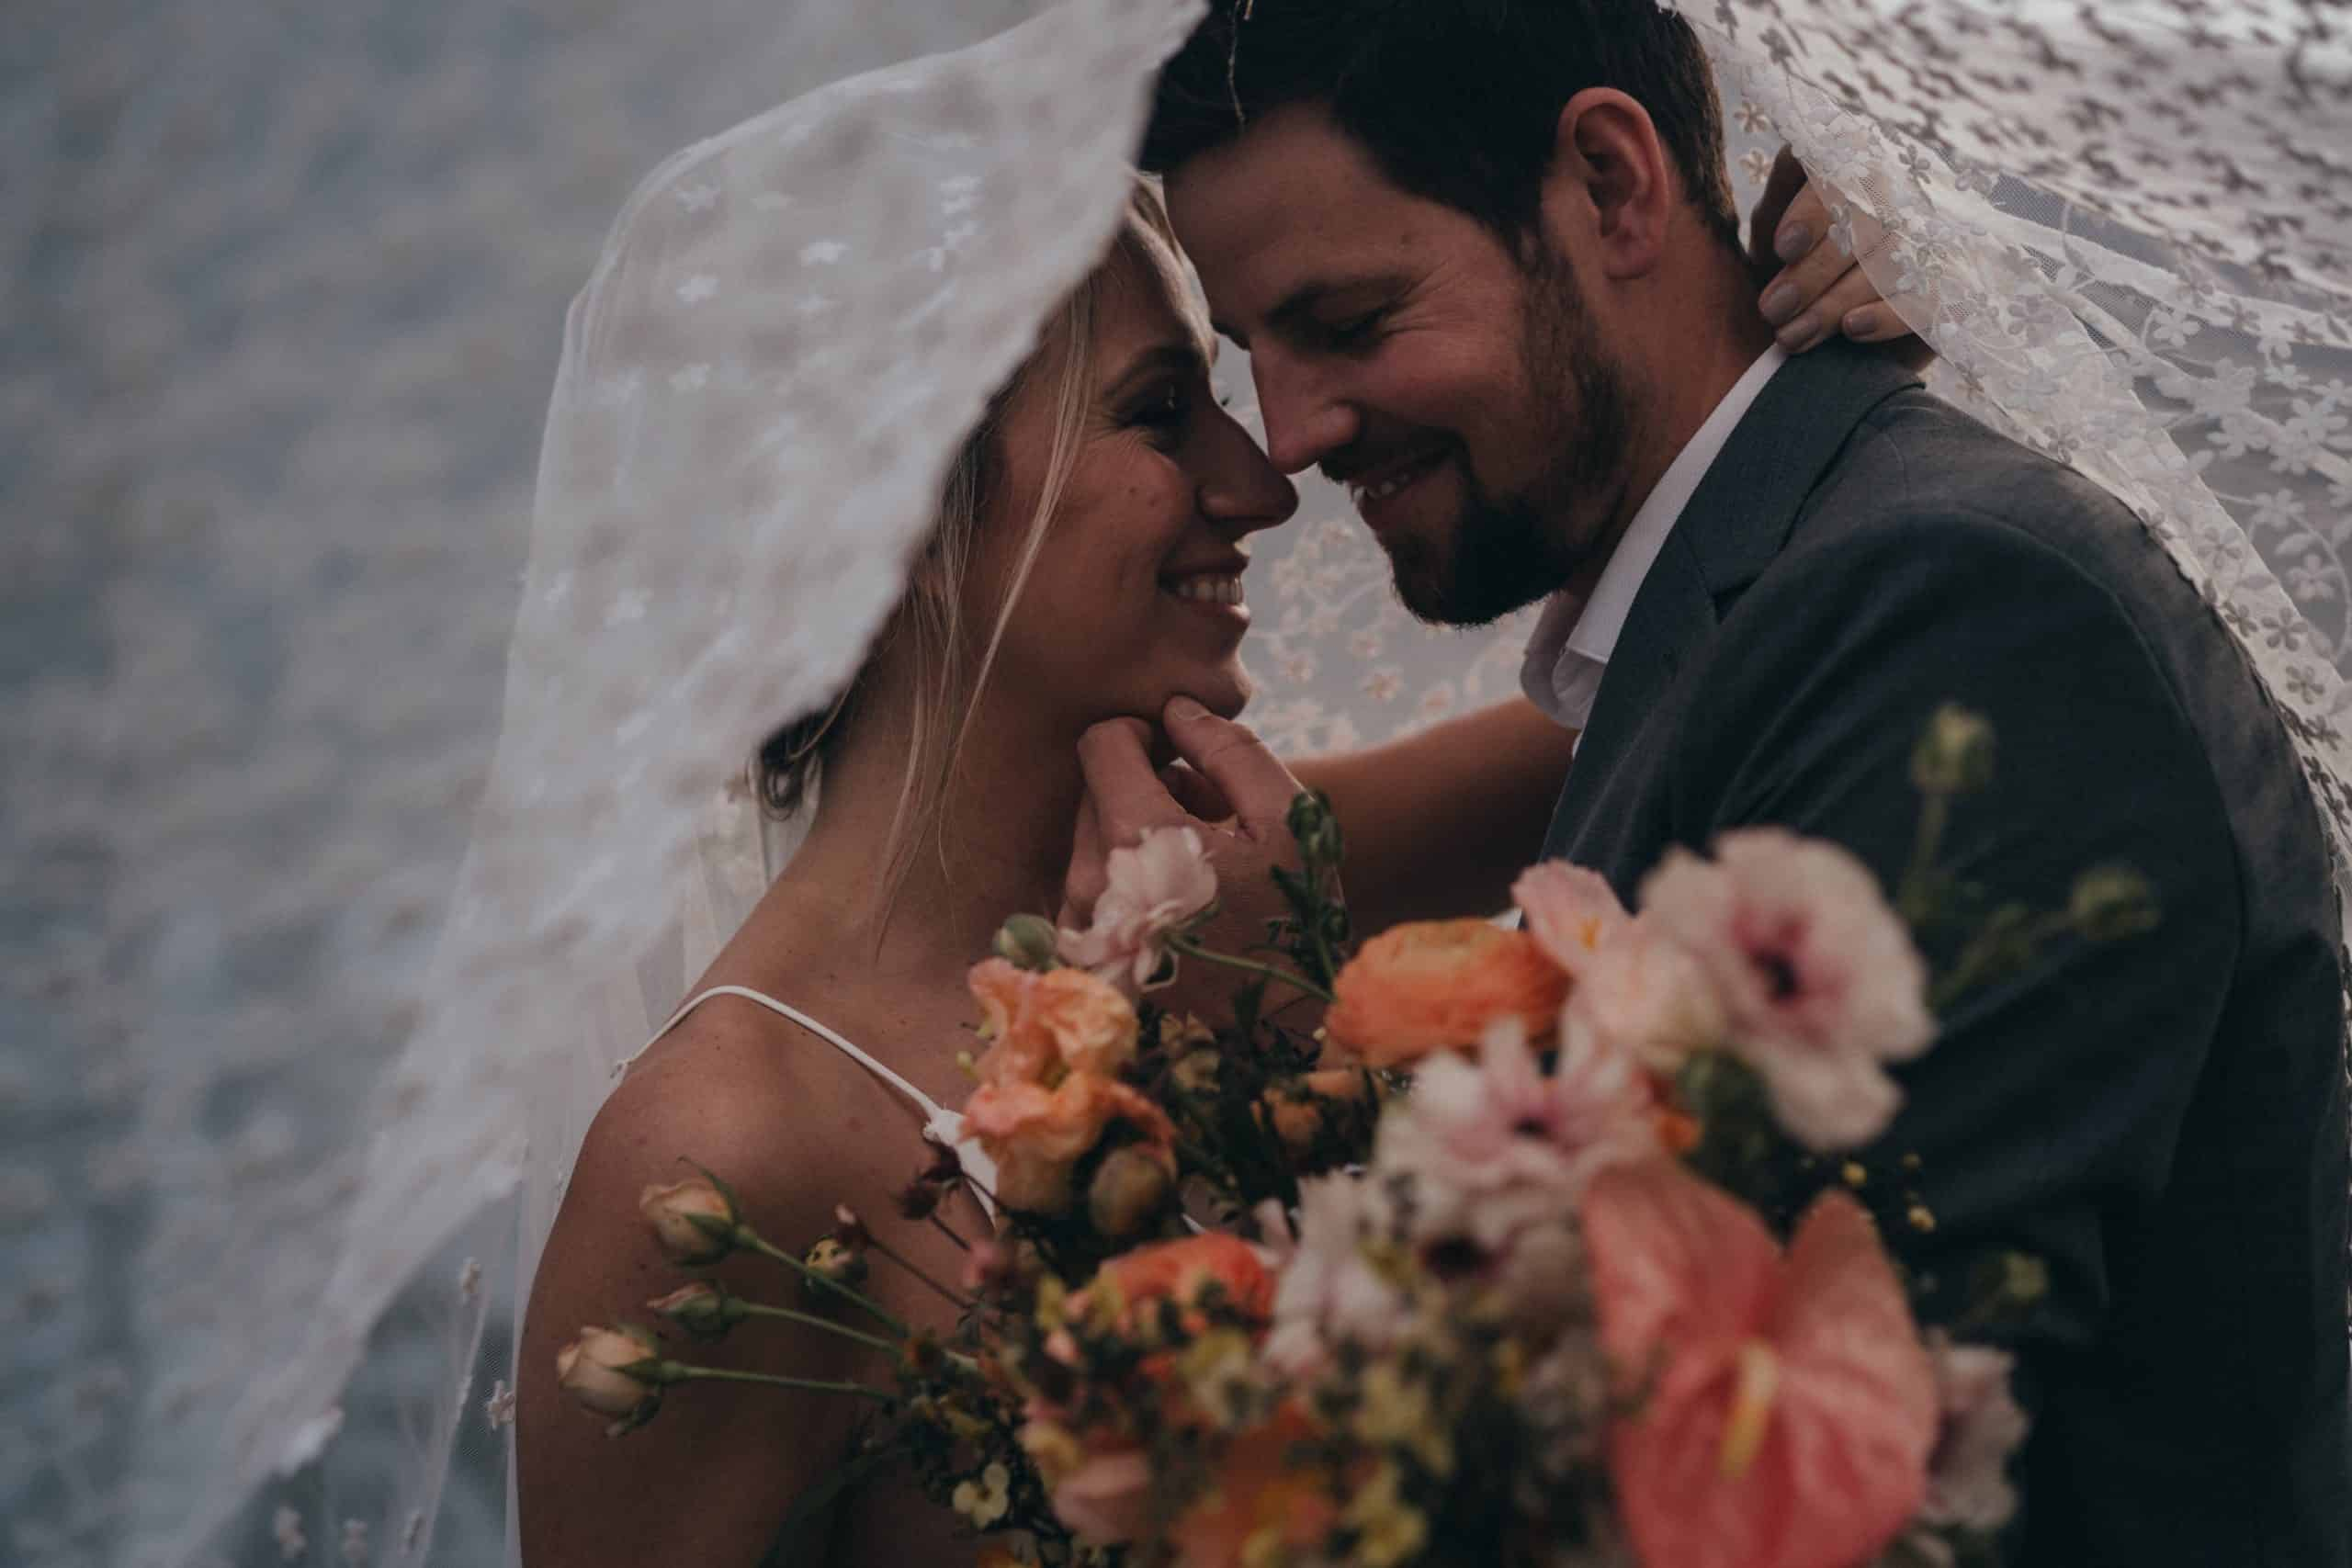 Wedding Photo Cleaning Elum, WA